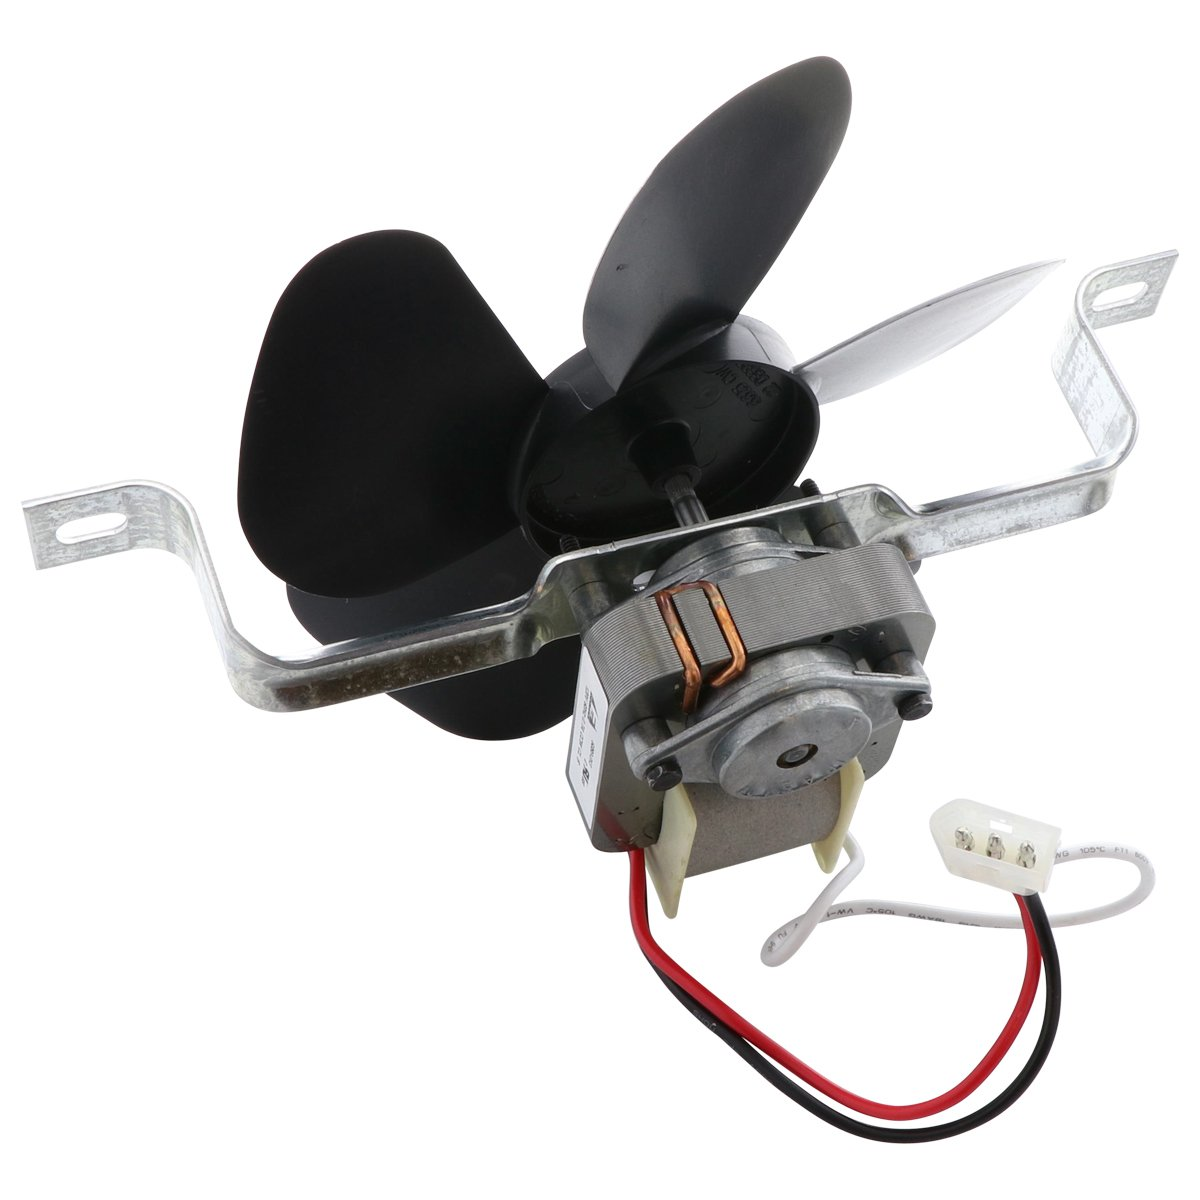 97012248 Range Hood Fan Motor Replacement for Broan Nautilus BP17, 99080492, S97012248